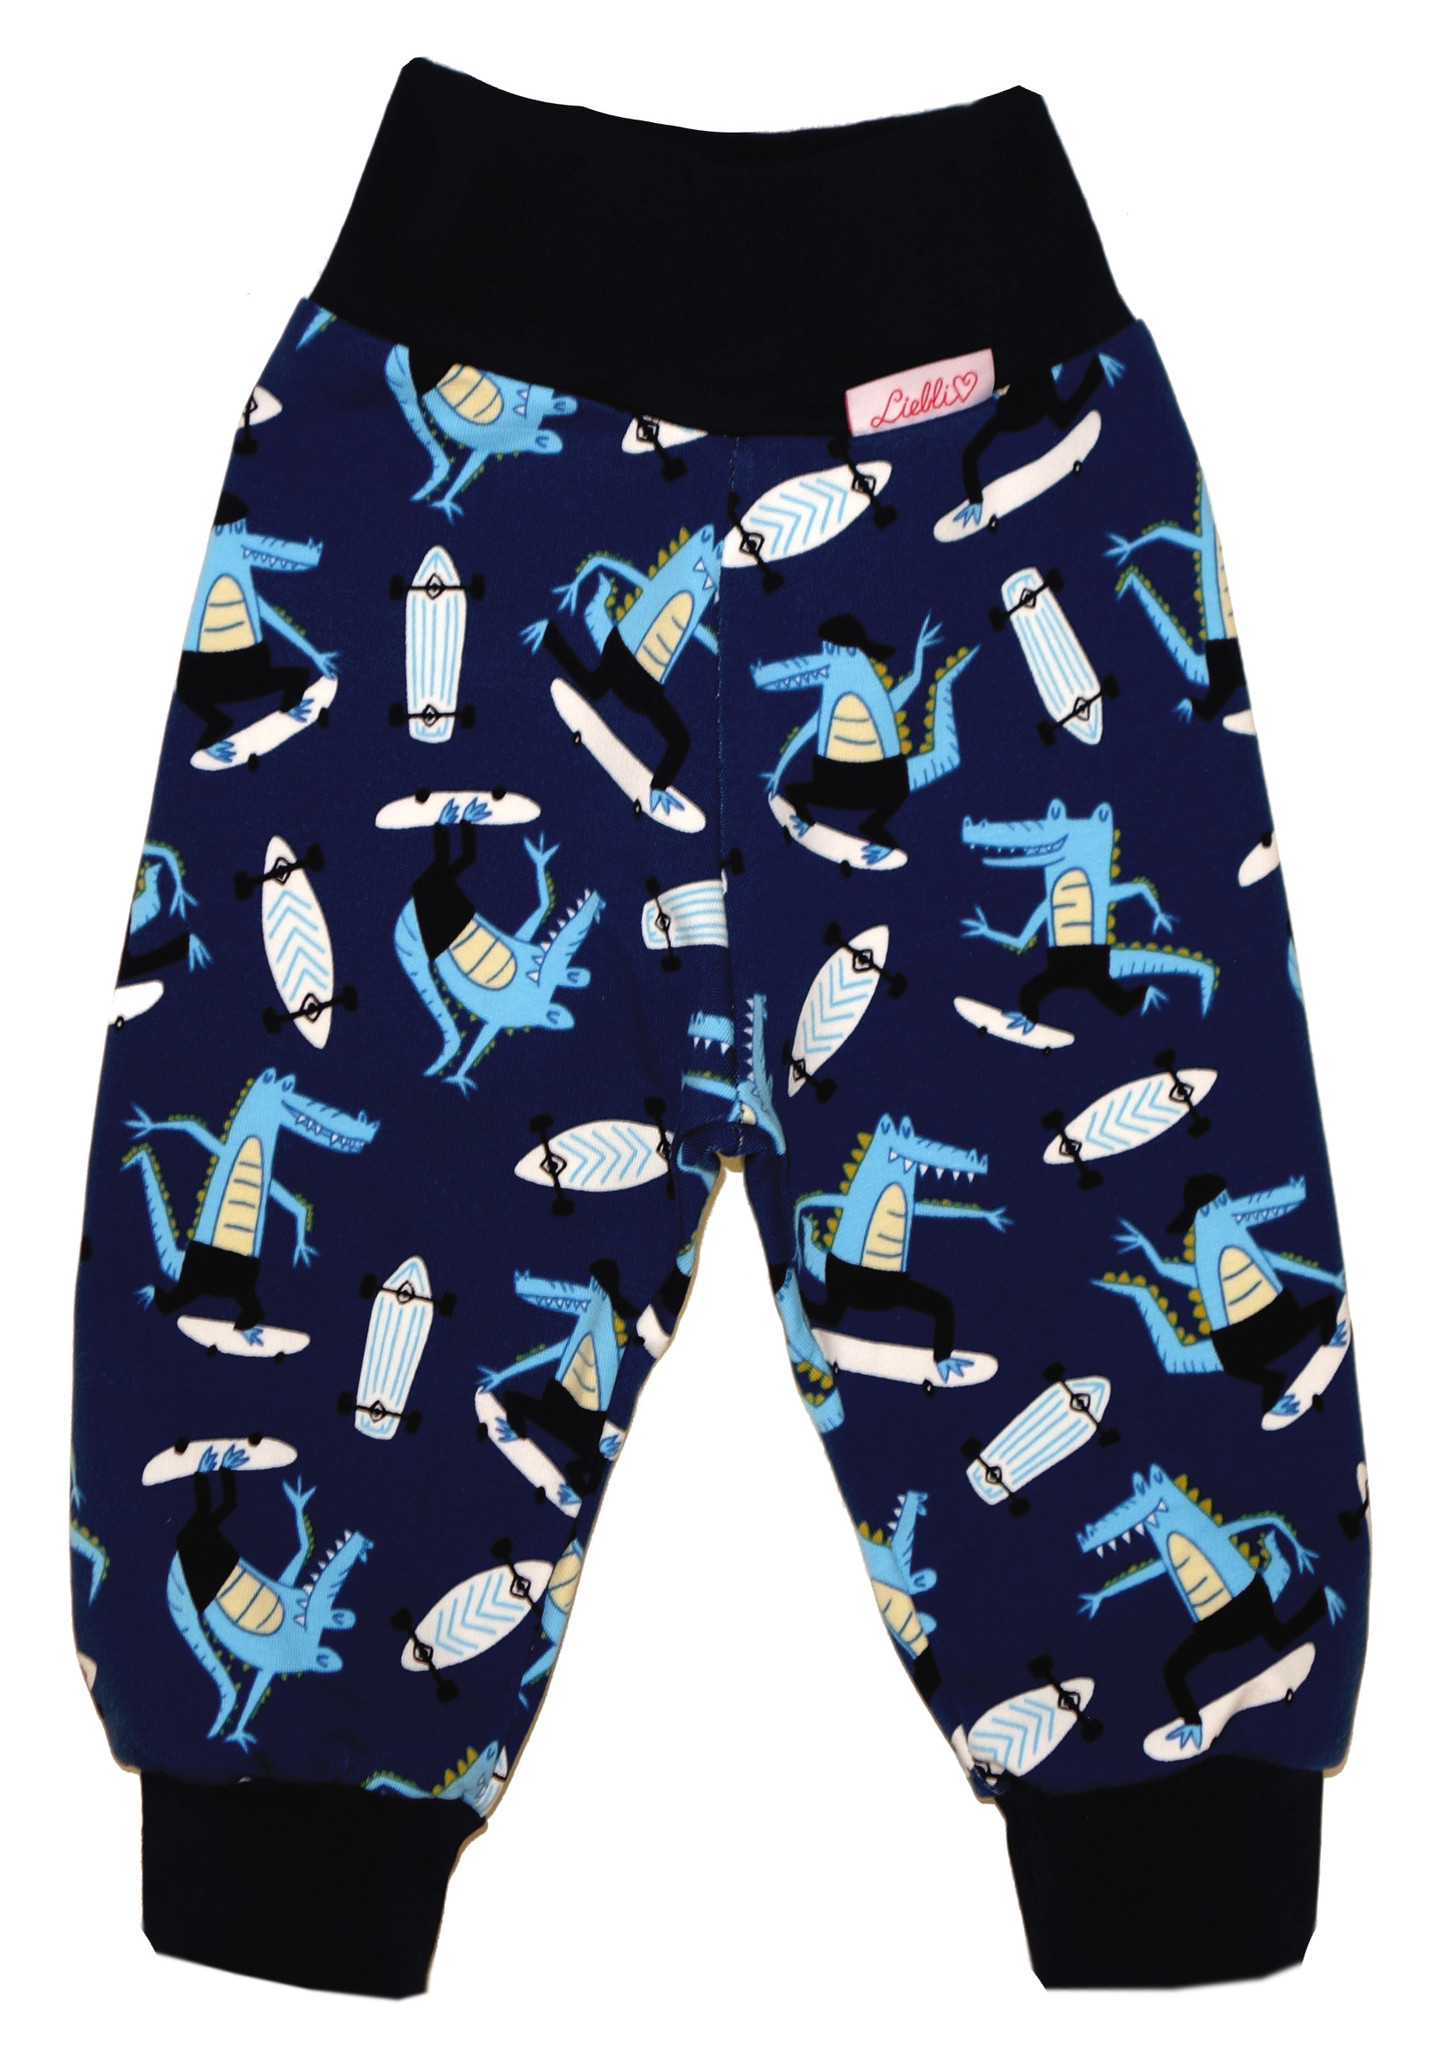 Kinderhose / Sweat-Hose, Krokodil auf Skateboard, dunkelblau